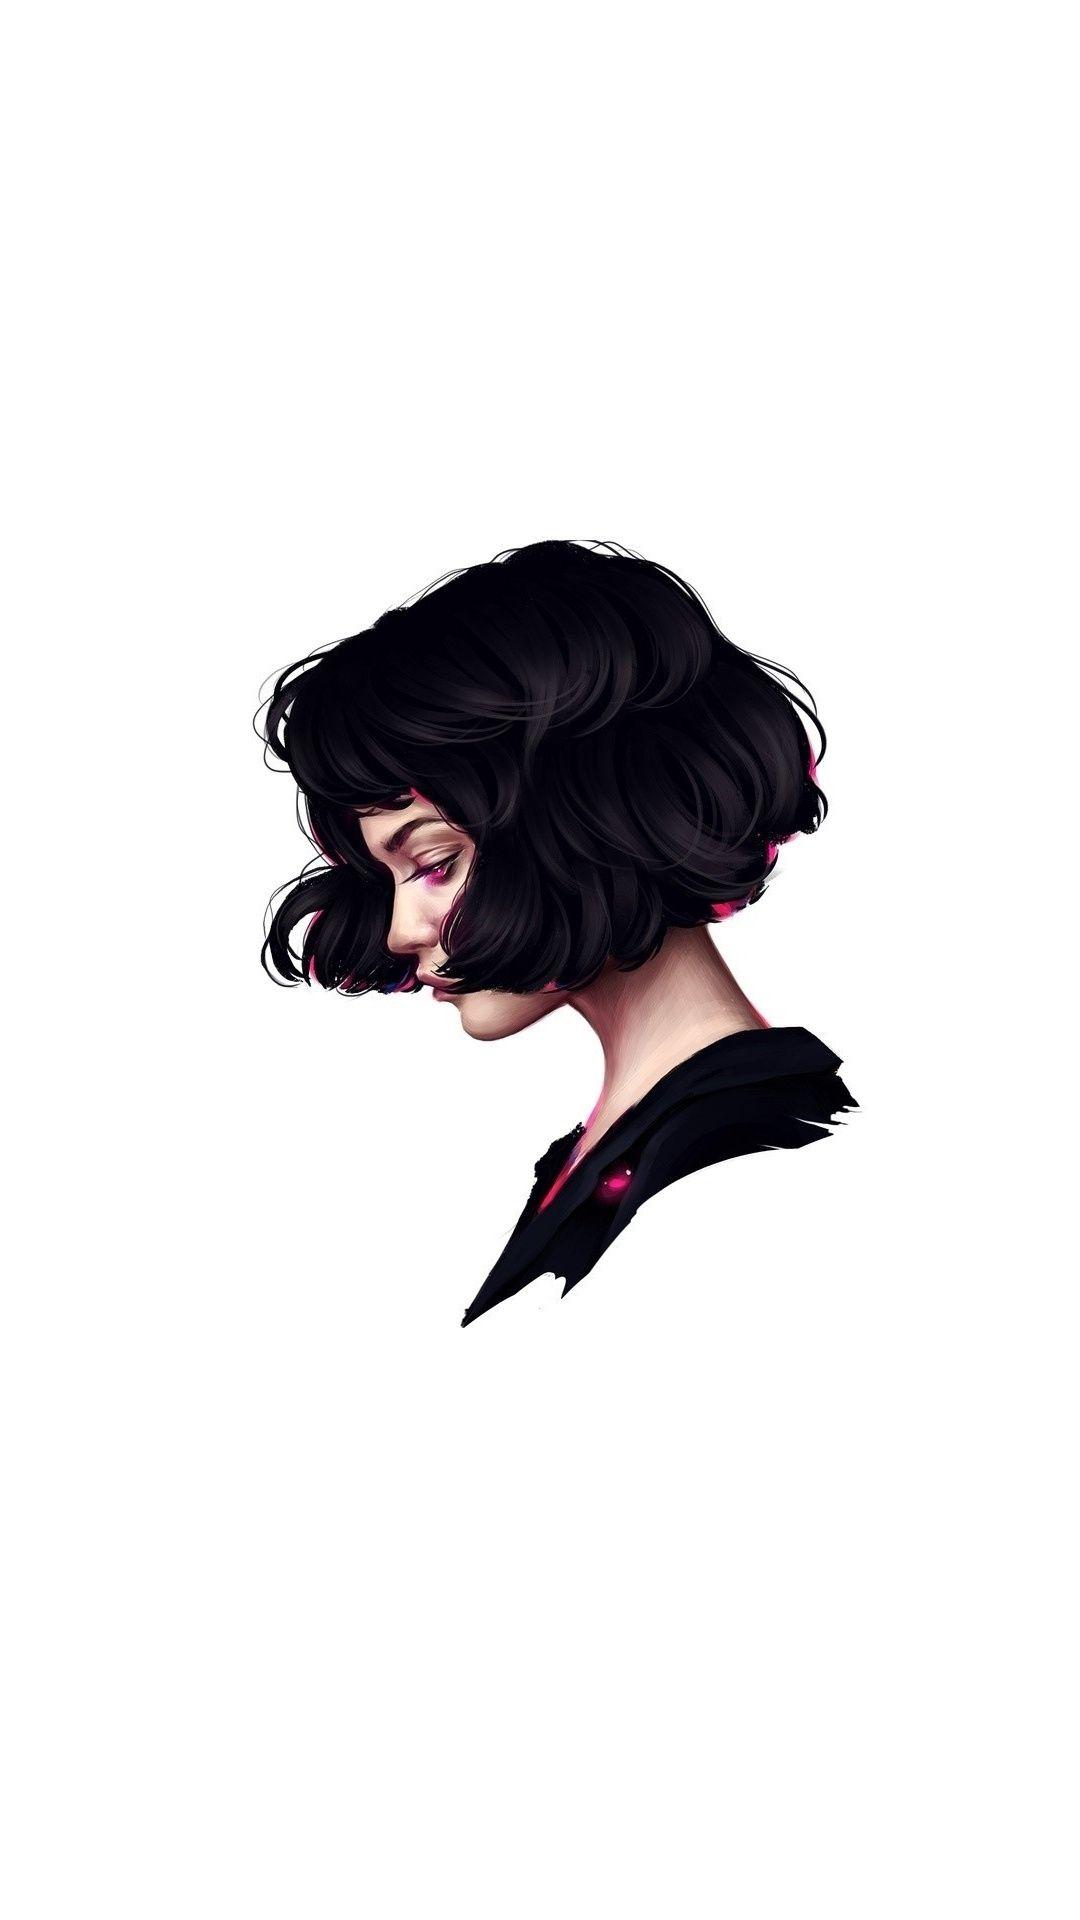 Minimal woman short hair art 1080x1920 wallpaper Short hair 1080x1920